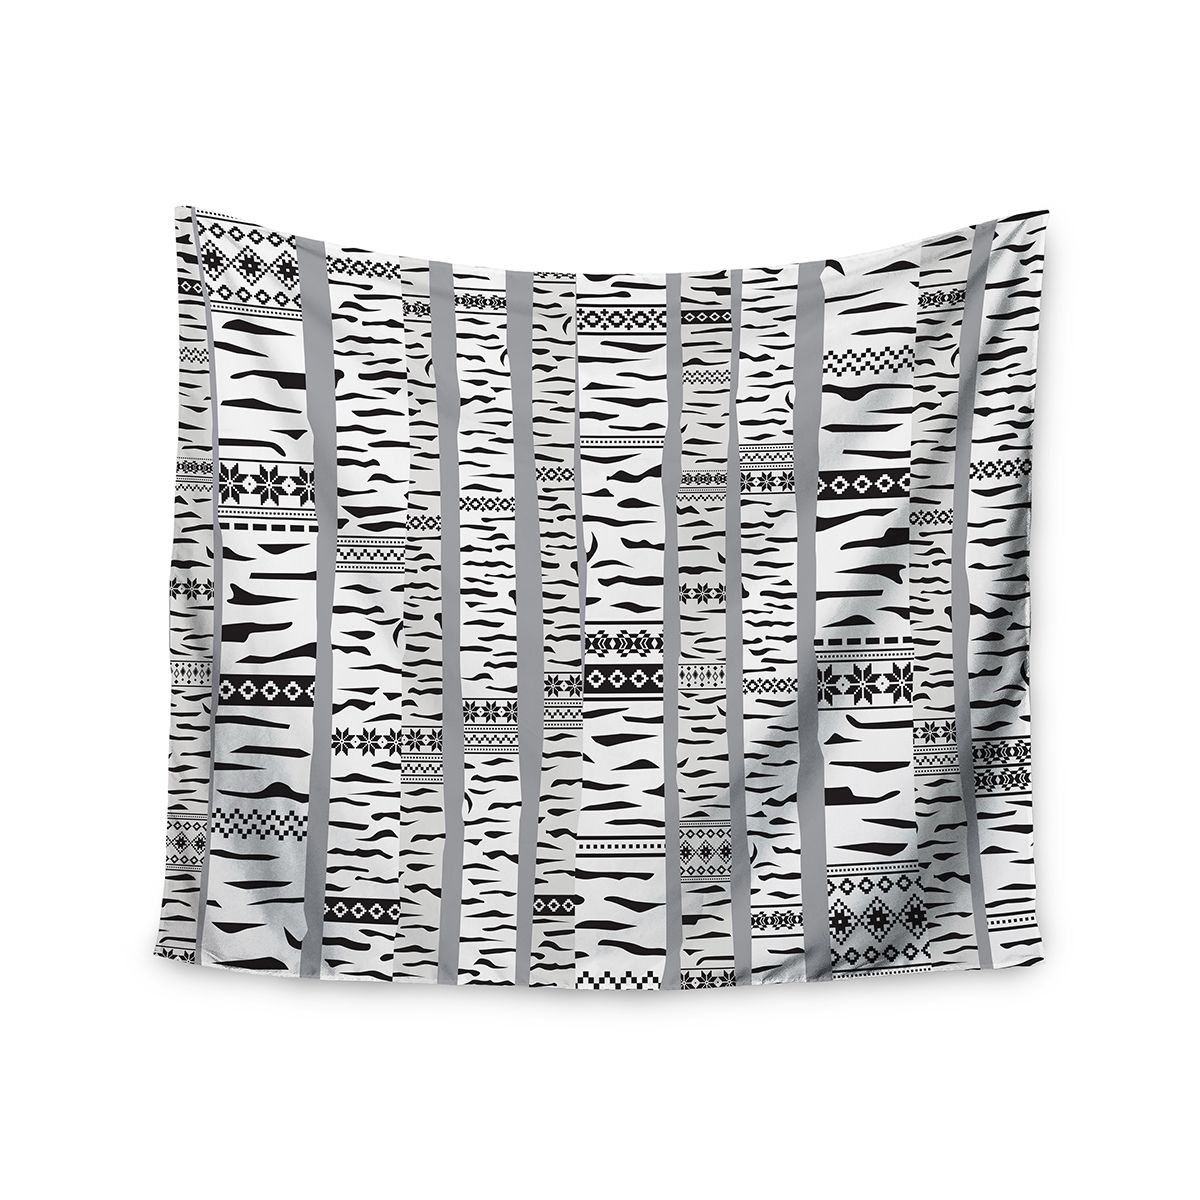 Kess InHouse Marta Olga Klara 'Birch Forest' Black White 51x60-inch Tapestry (Birch Forest) (Polyester)